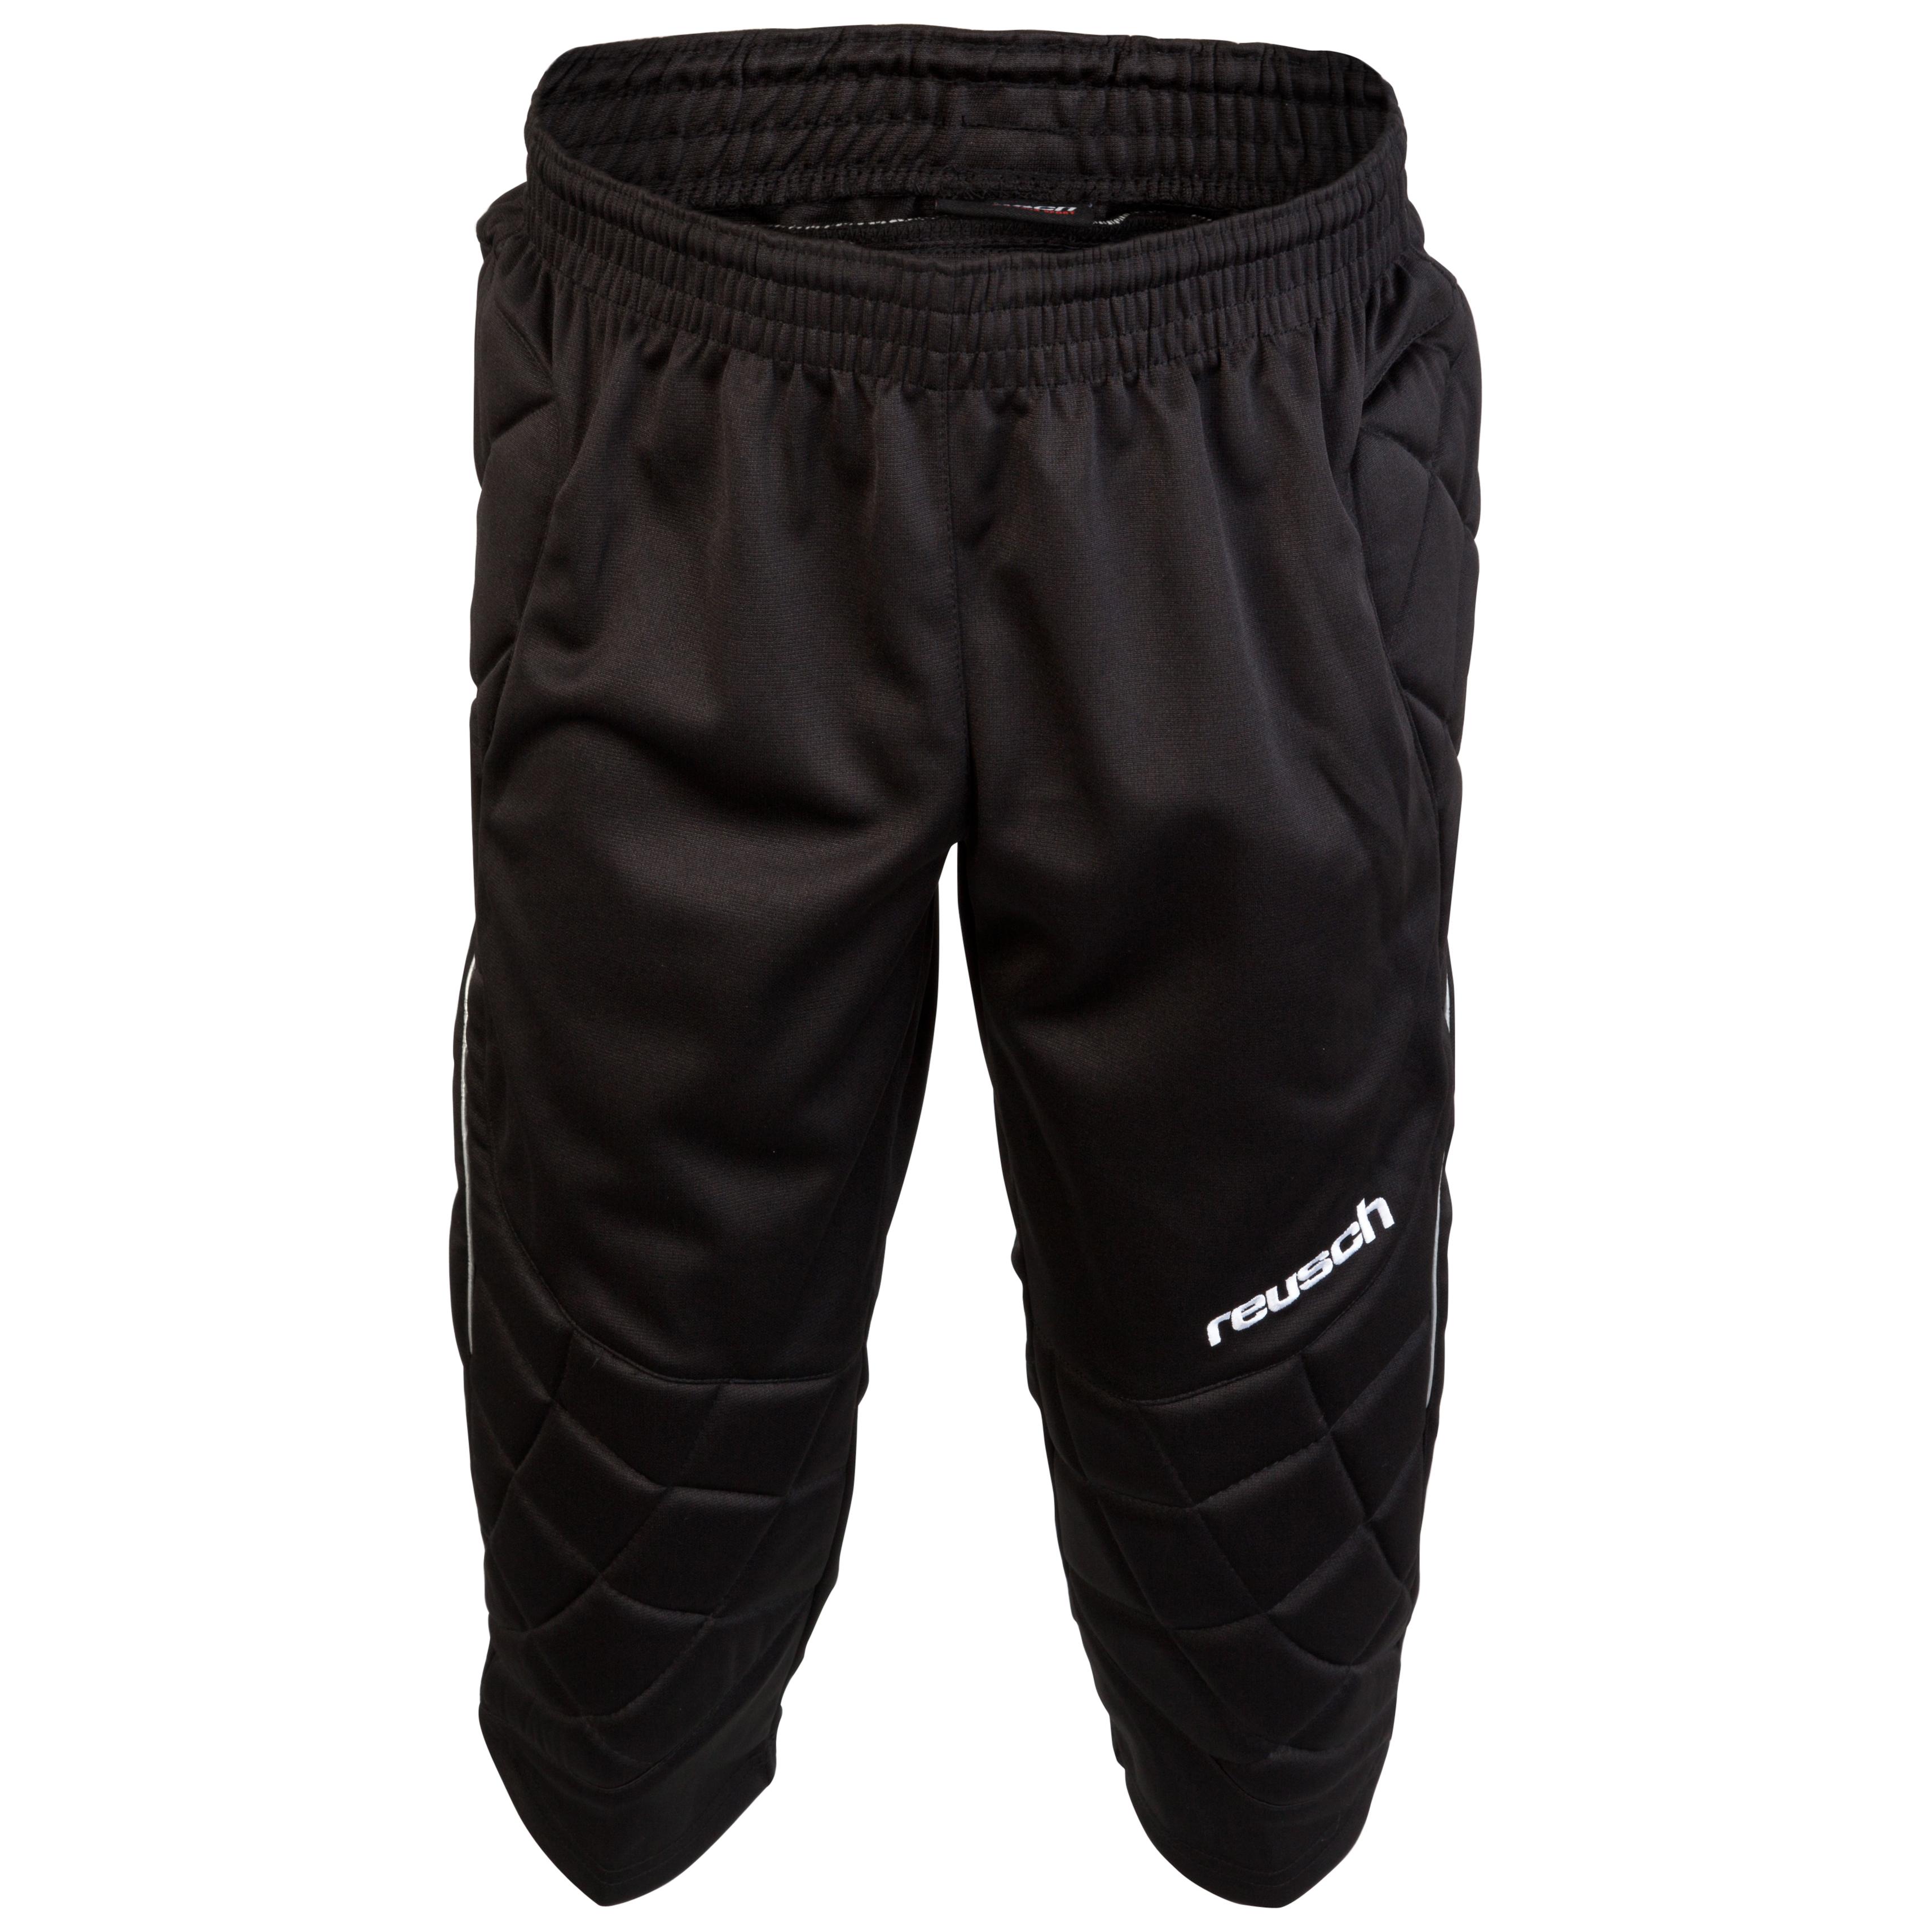 Reusch 360 Protection 3/4 Goalkeeping Pants-Black